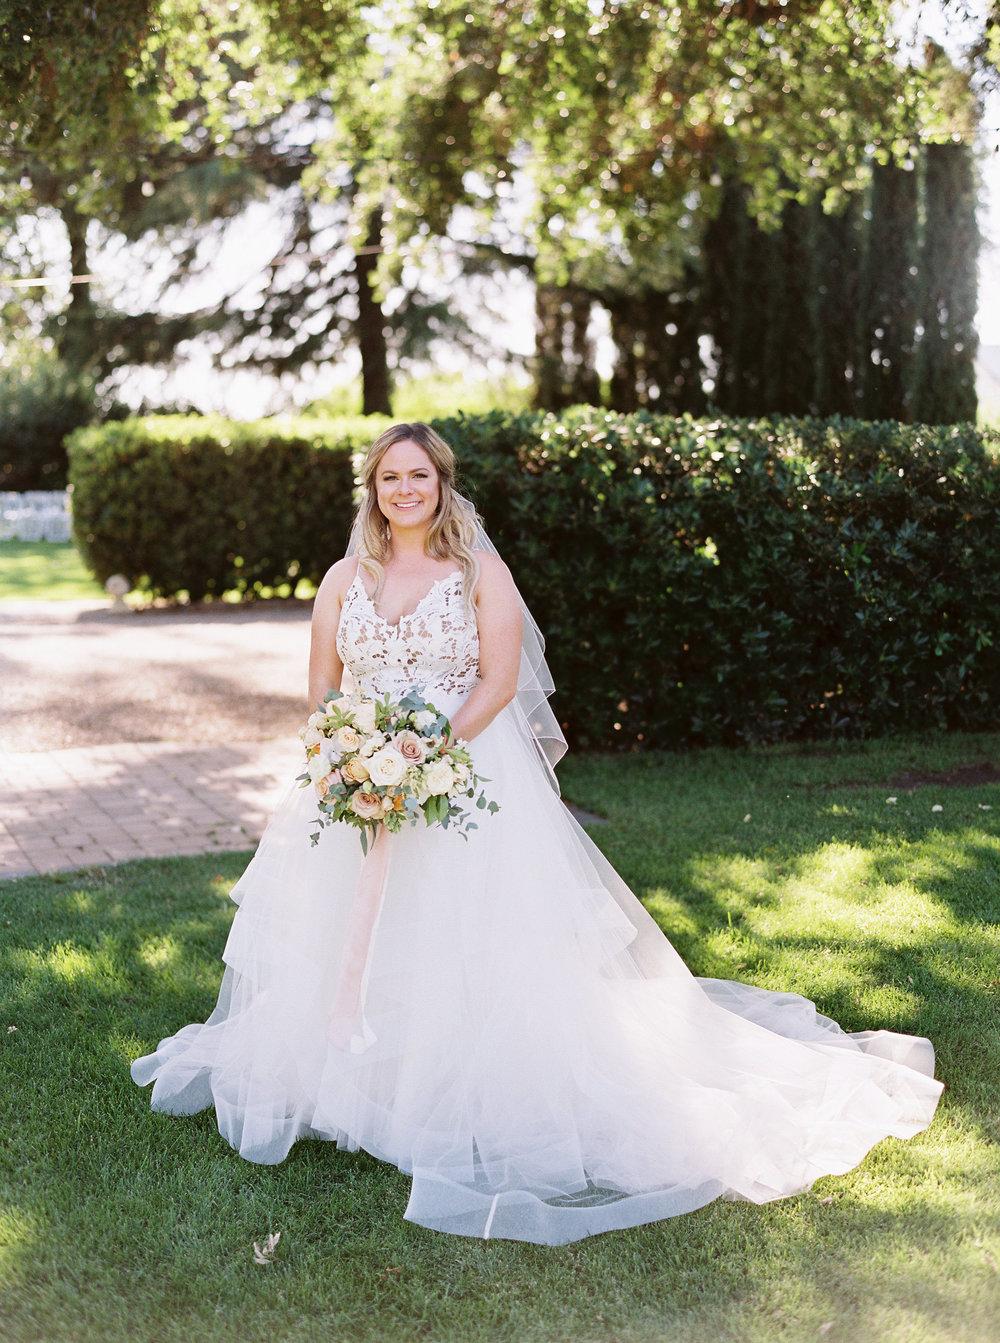 Durst-winery-wedding-in-lodi-calfornia-140.jpg